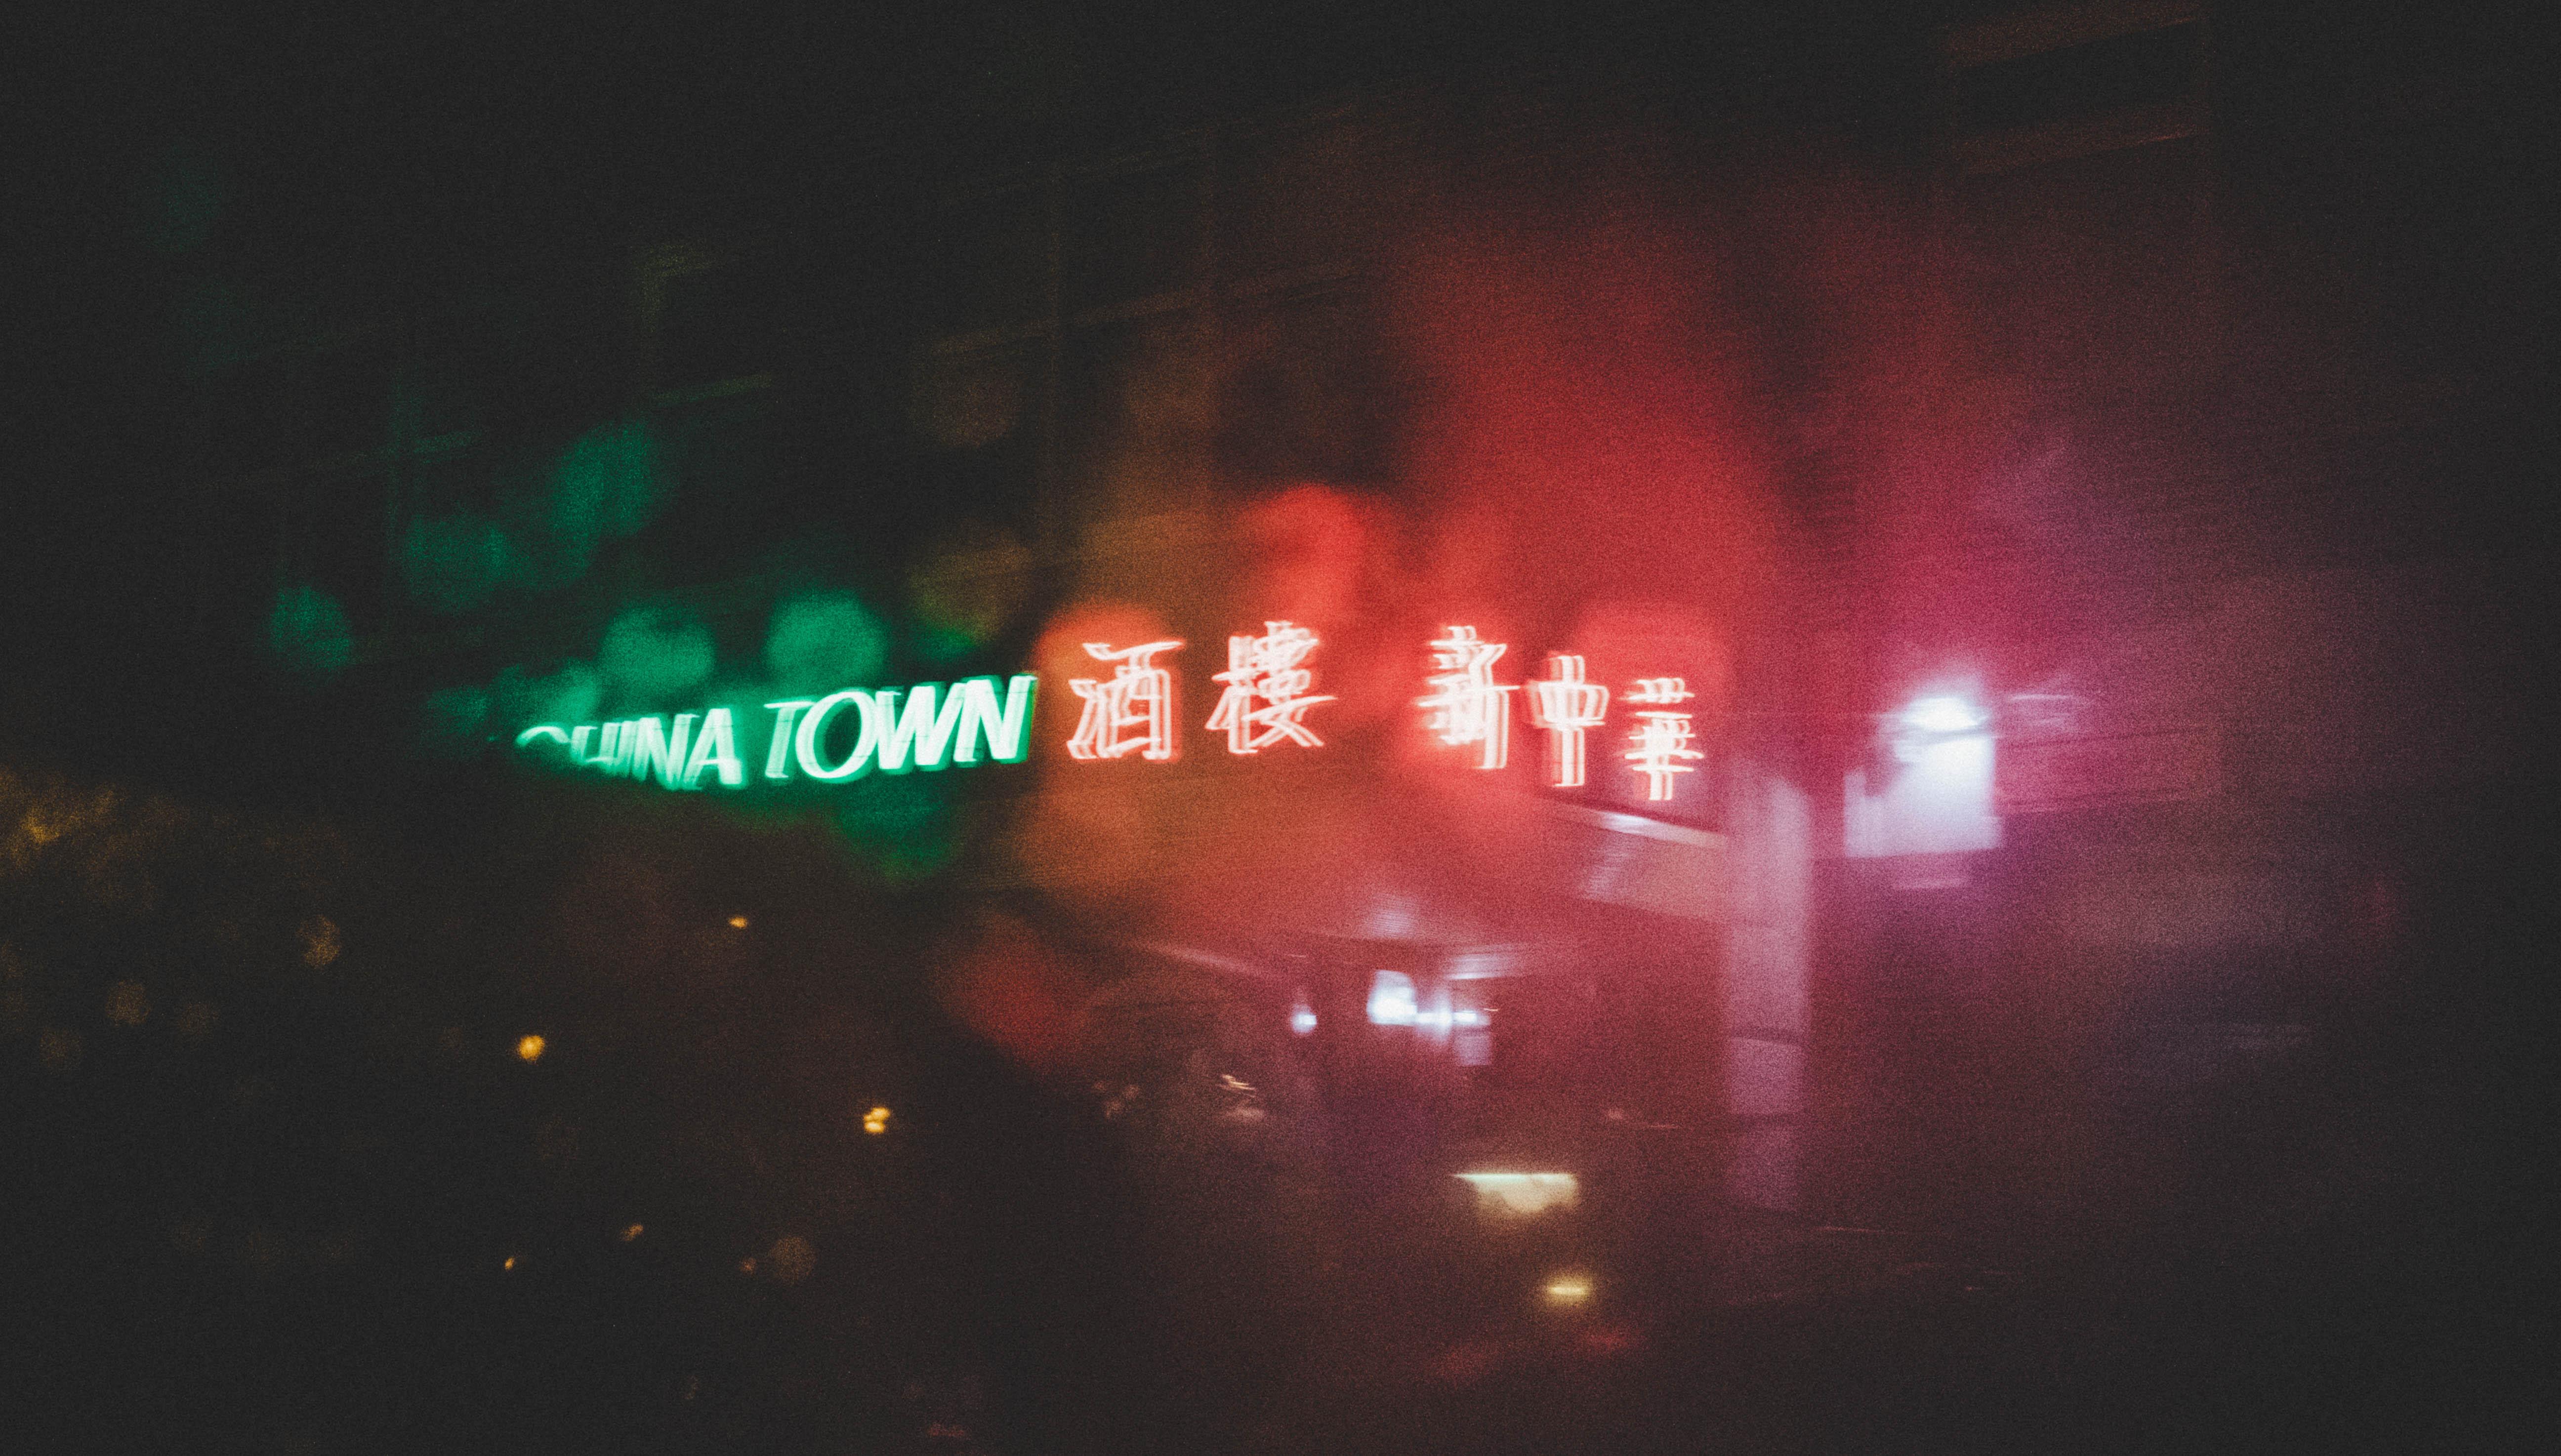 Blur china town signage